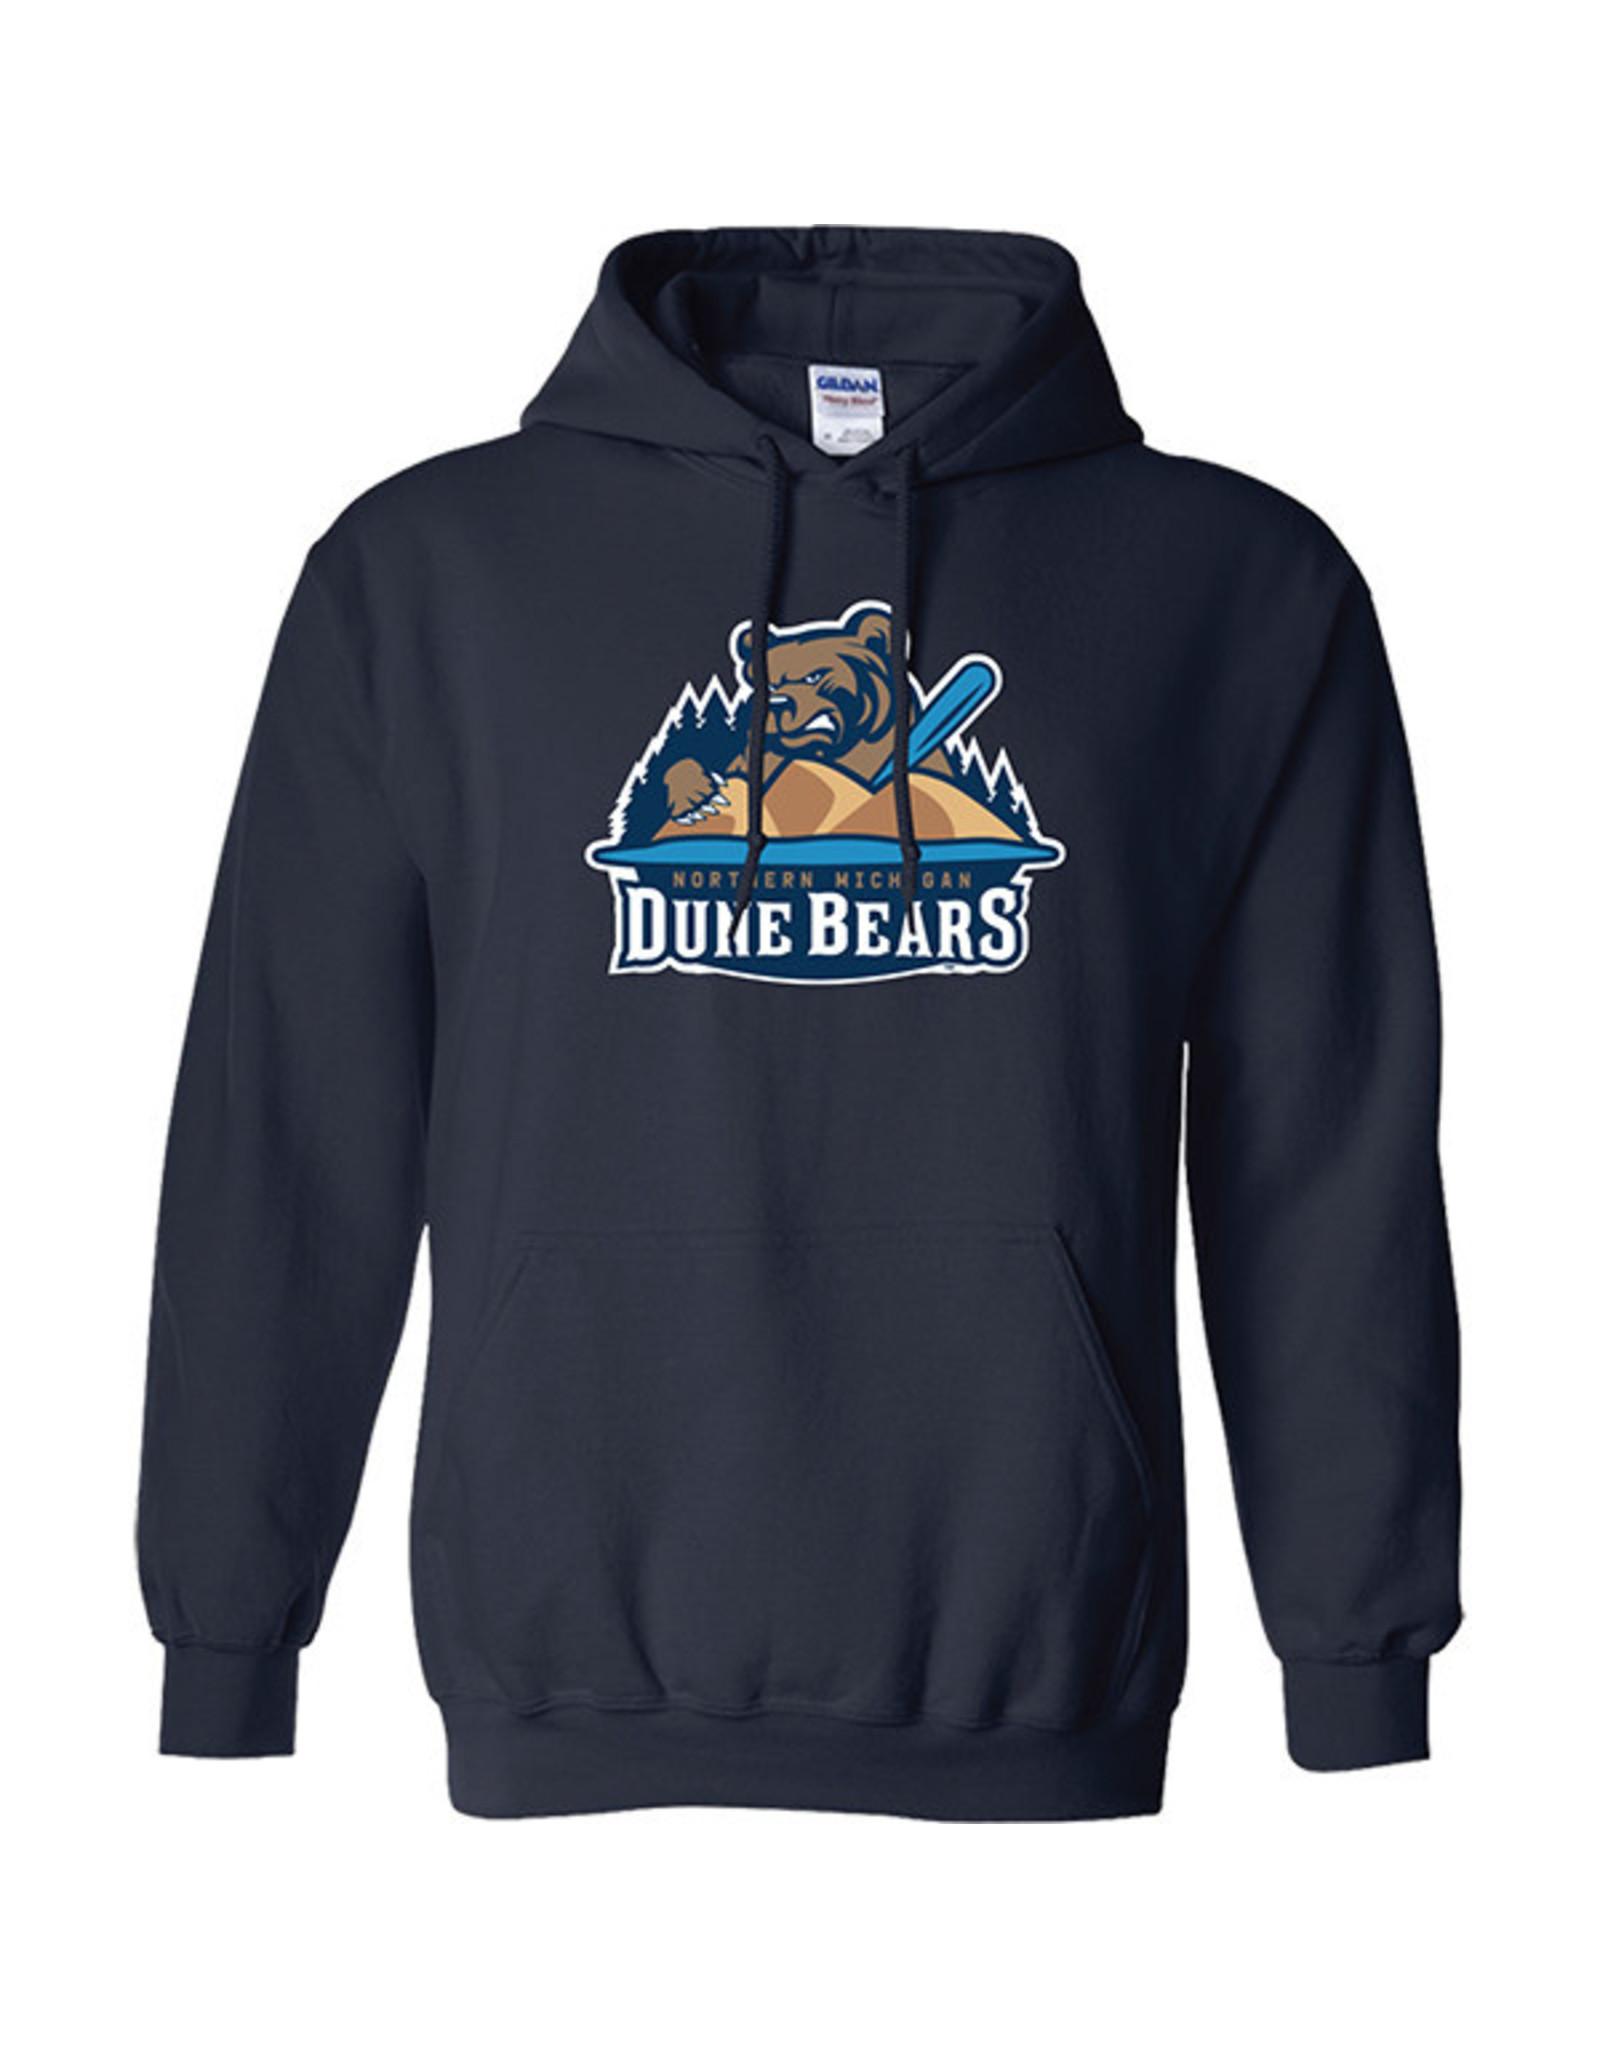 3100 Dune Bears Navy Hood